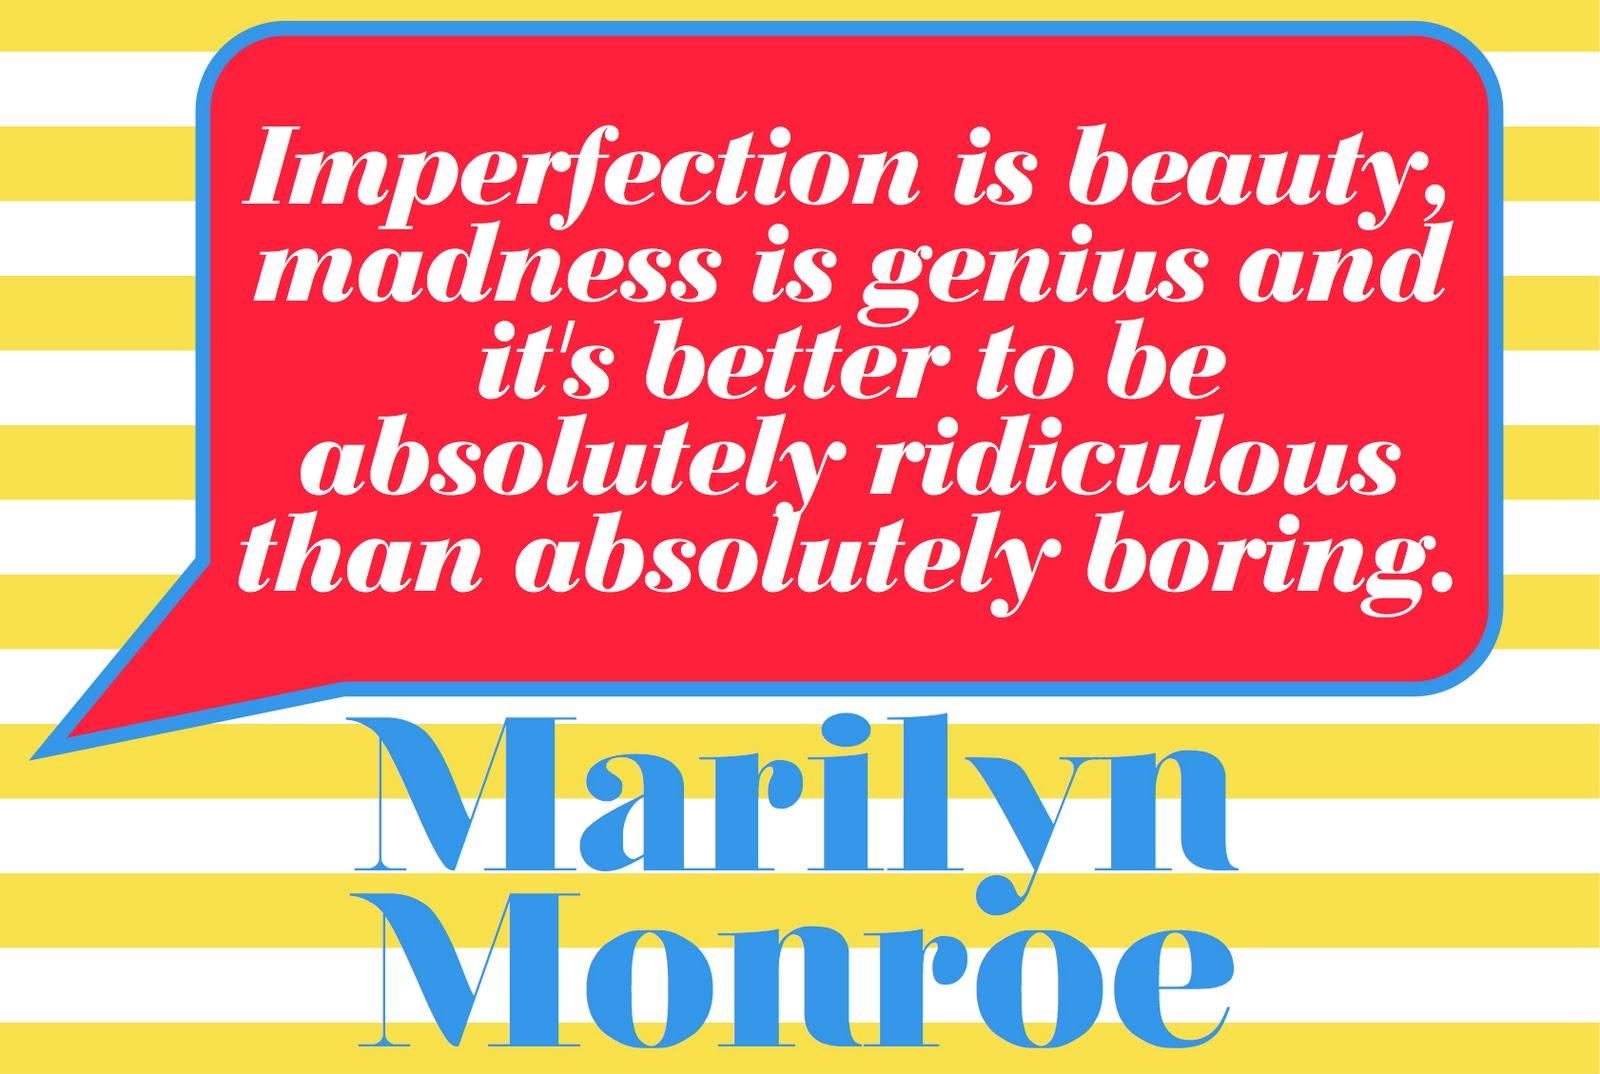 http://3.bp.blogspot.com/-9Z35omeefCg/Te7nBbATTAI/AAAAAAAAMCg/EcTPWs5BZnE/s1600/5-6-11+Marilyn+Monroe.jpg